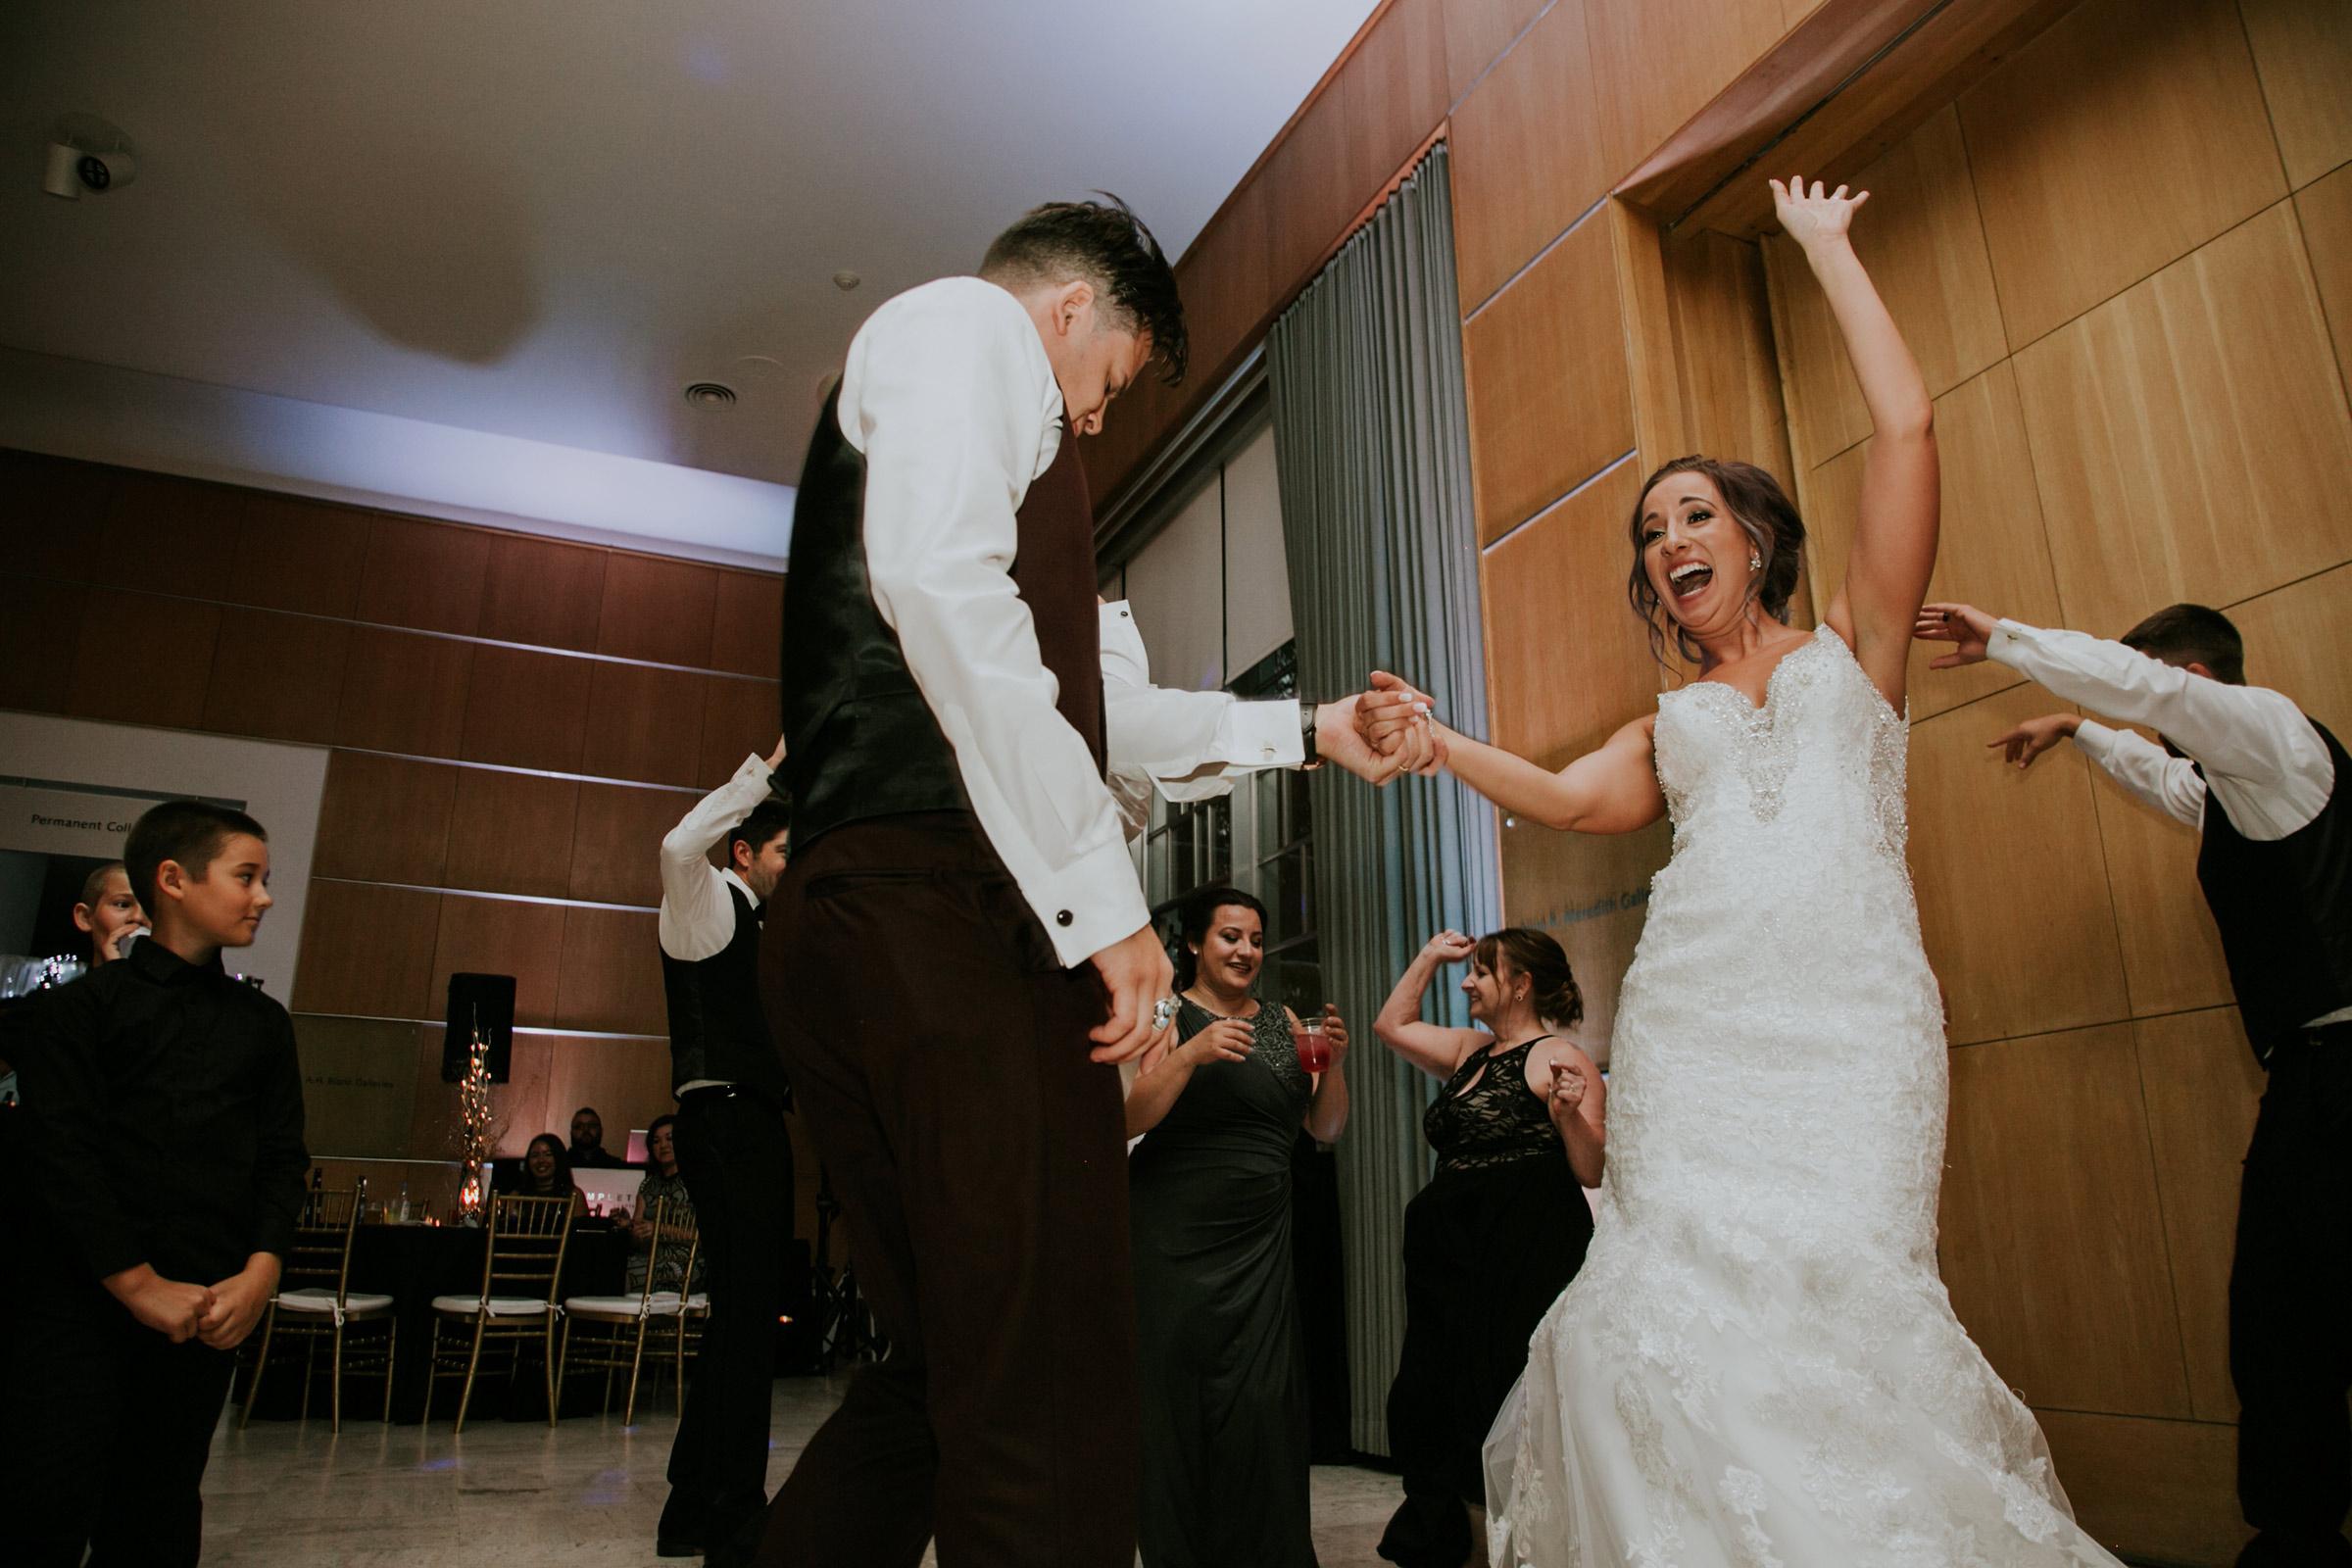 bride-groom-swinging-each-other-around-on-dance-floor-desmoines-iowa-art-center-raelyn-ramey-photography.jpg